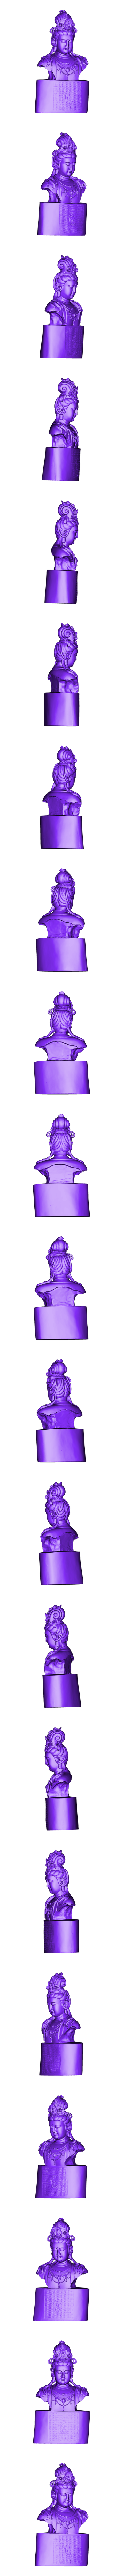 47guanyin.obj Download free OBJ file guanyin bodhisattva kwan-yin sculpture for cnc or 3d printer 47 • 3D printer template, stlfilesfree